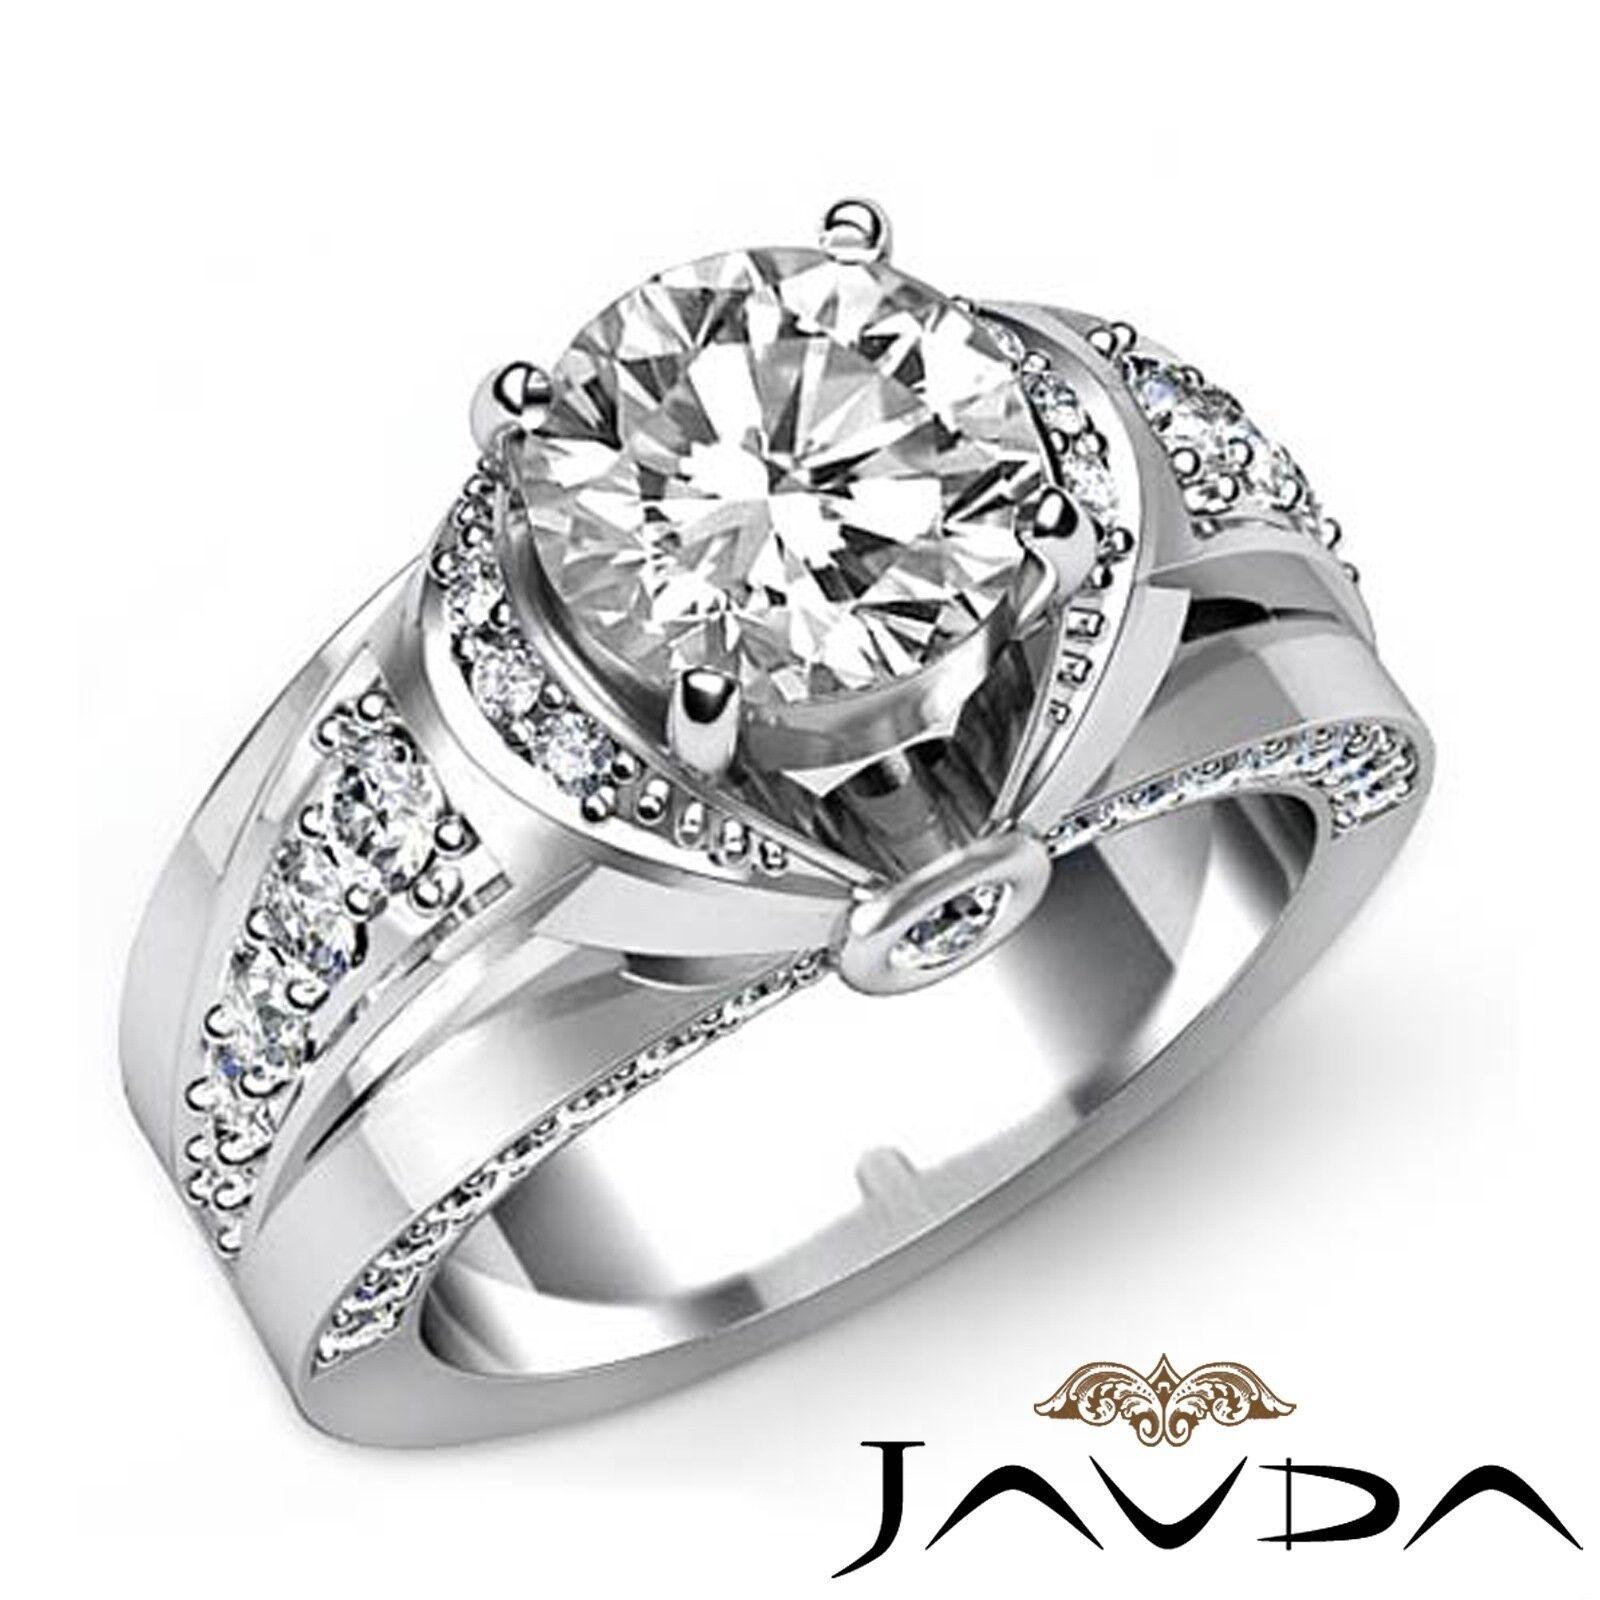 1.7ct Knot Classic Sidestone Round Diamond Engagement Ring GIA H-VVS2 White Gold